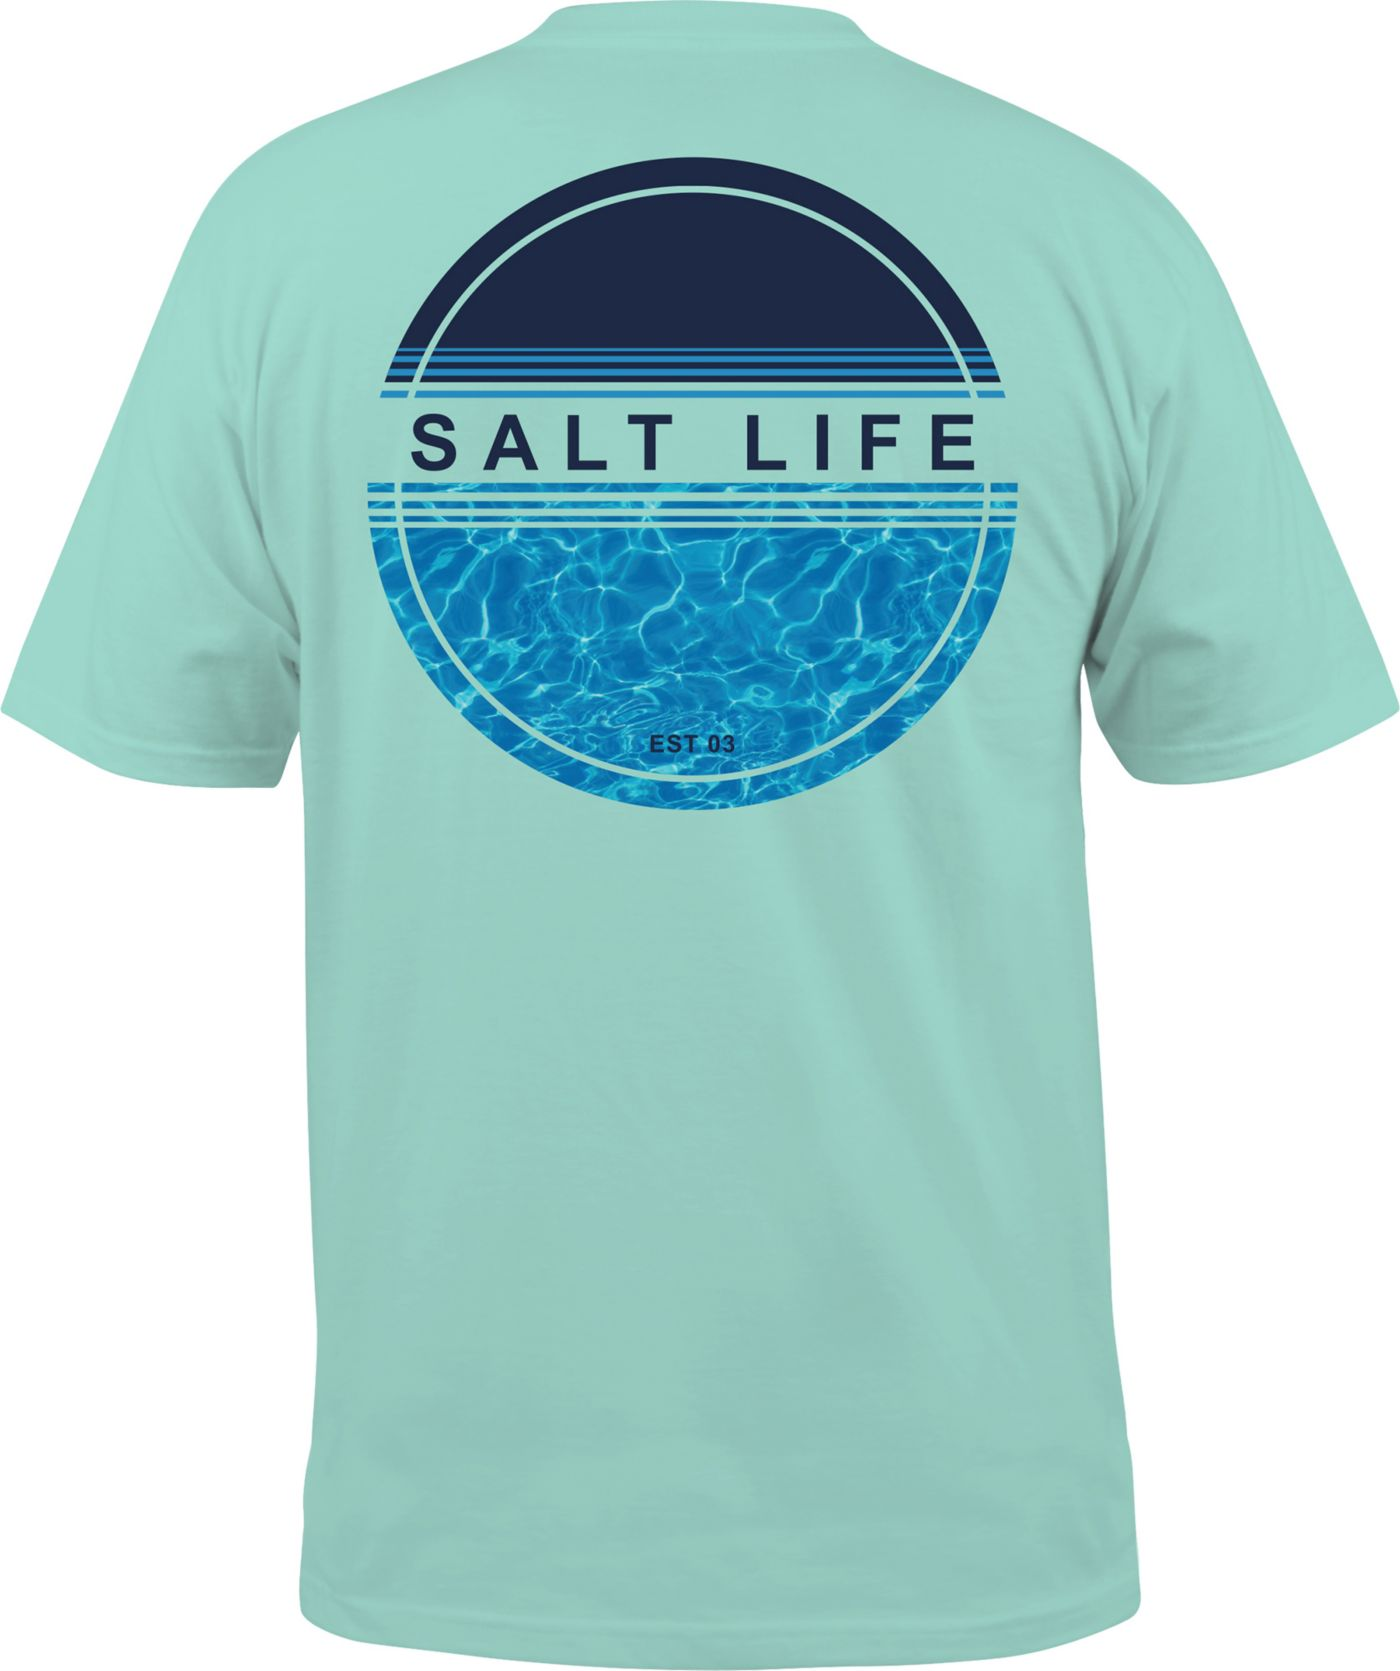 Salt Life Men's Calm Waters T-Shirt